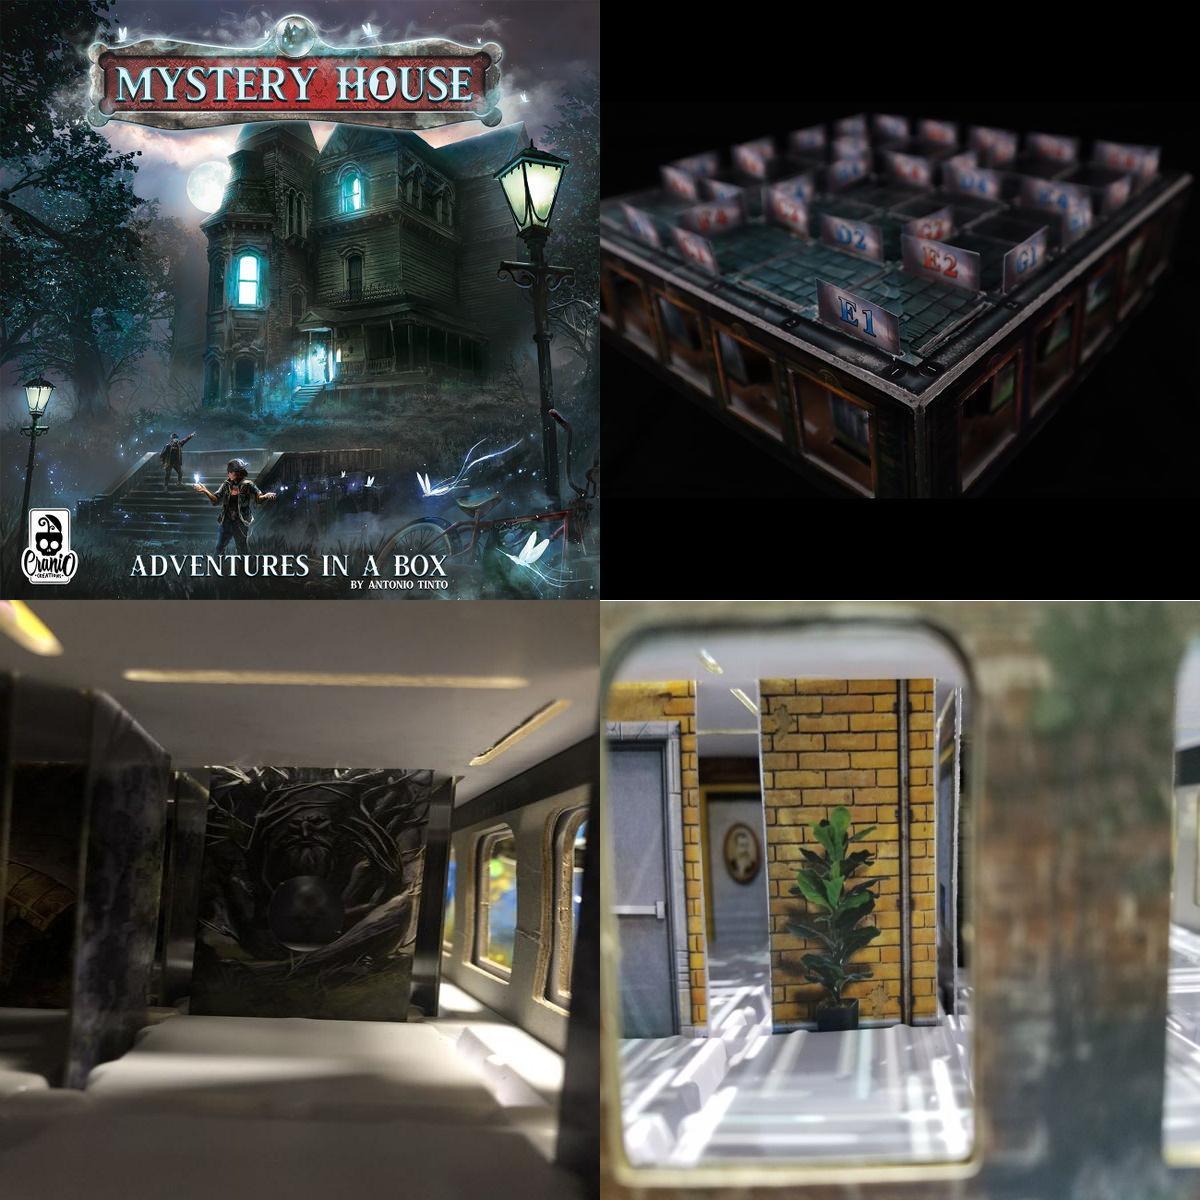 Mysteryhousemontage1